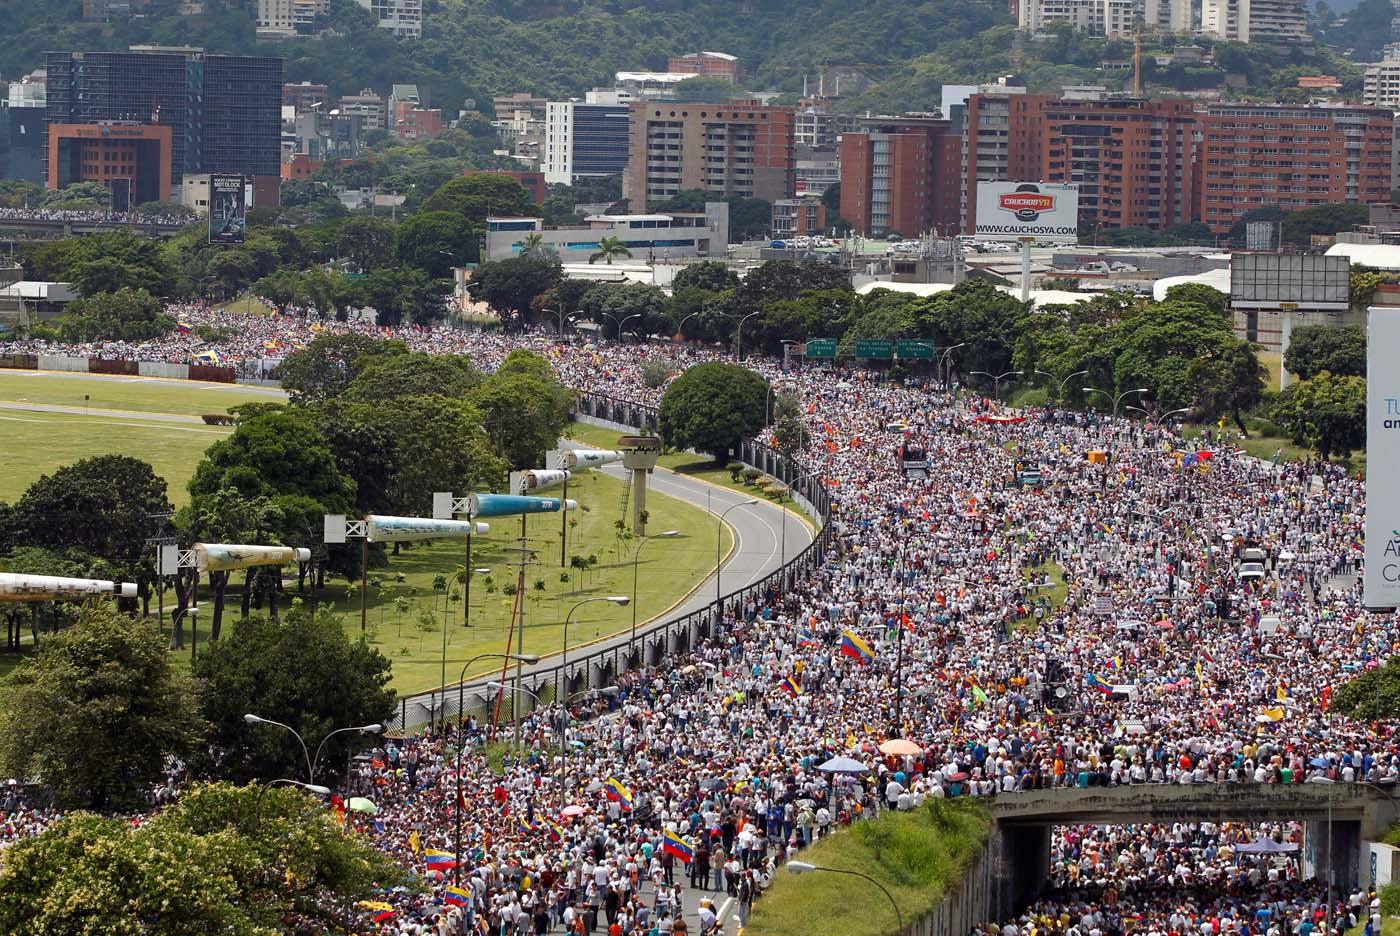 2016-10-26T175411Z_1753464420_S1AEUJFTMHAA_RTRMADP_3_VENEZUELA-POLITICS